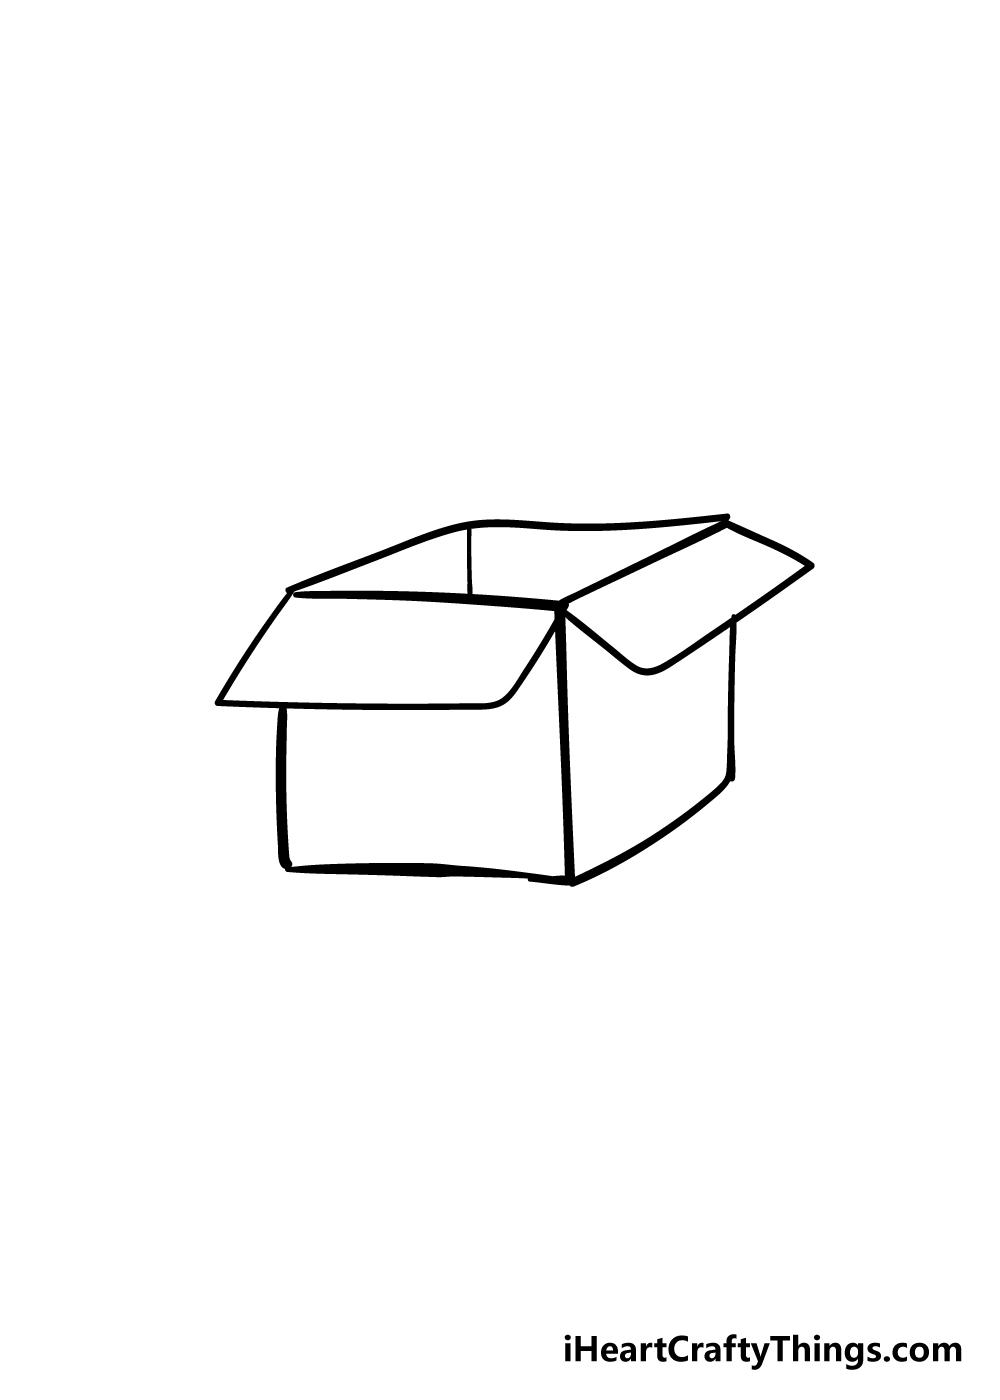 box drawing step 5